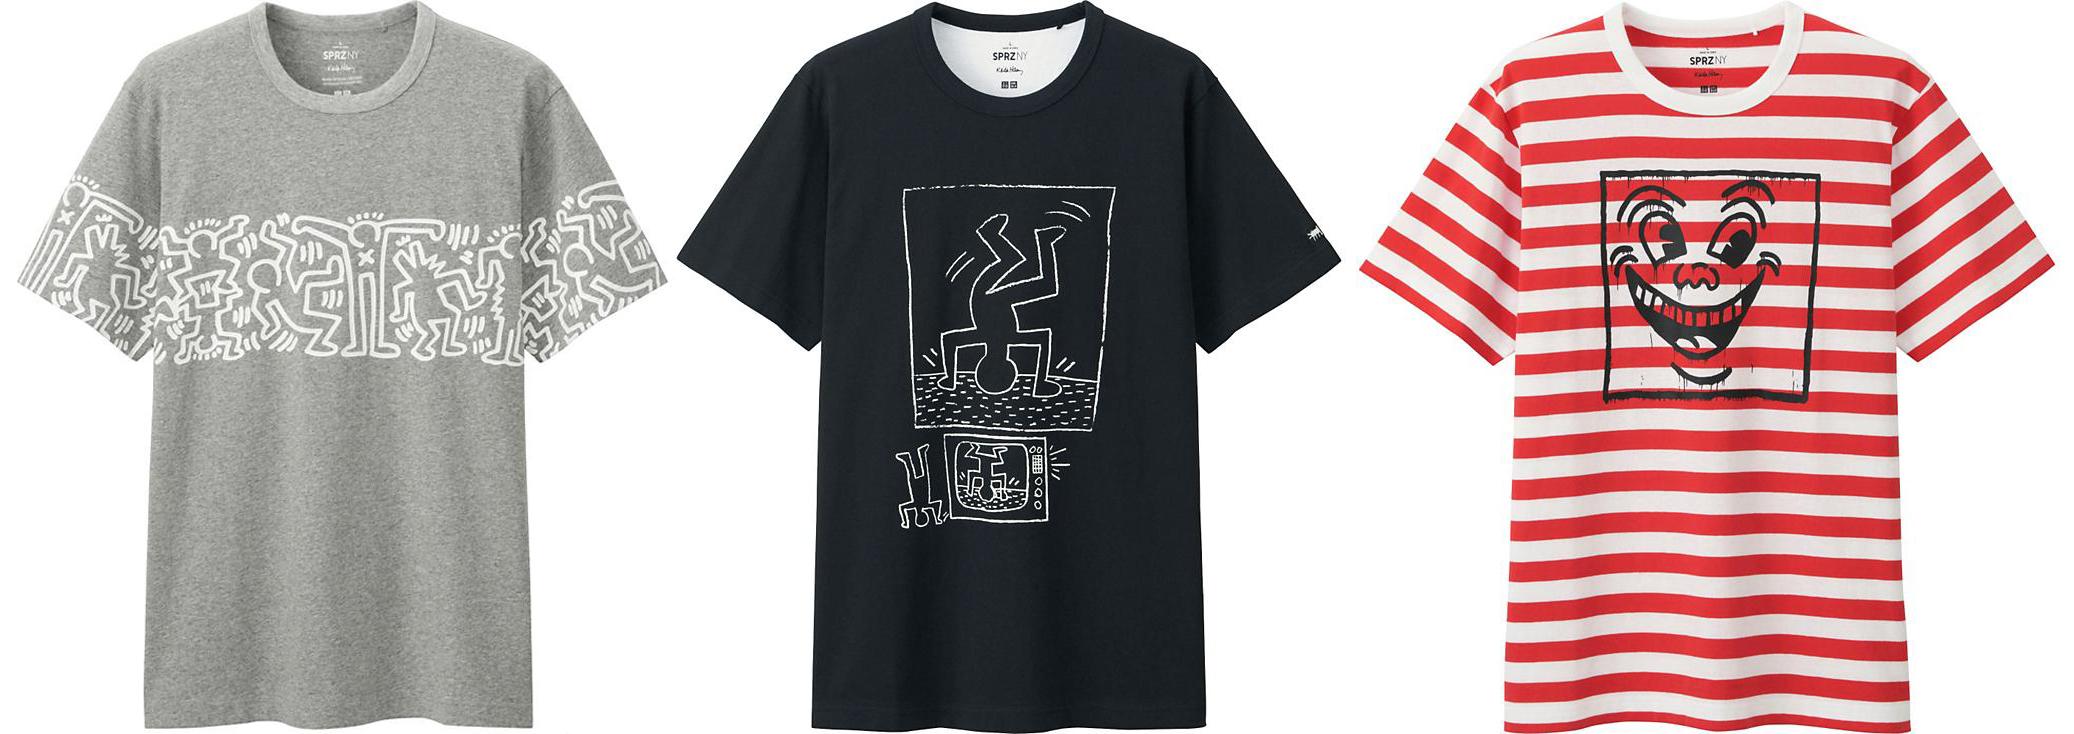 Uniqlo x Keith Haring